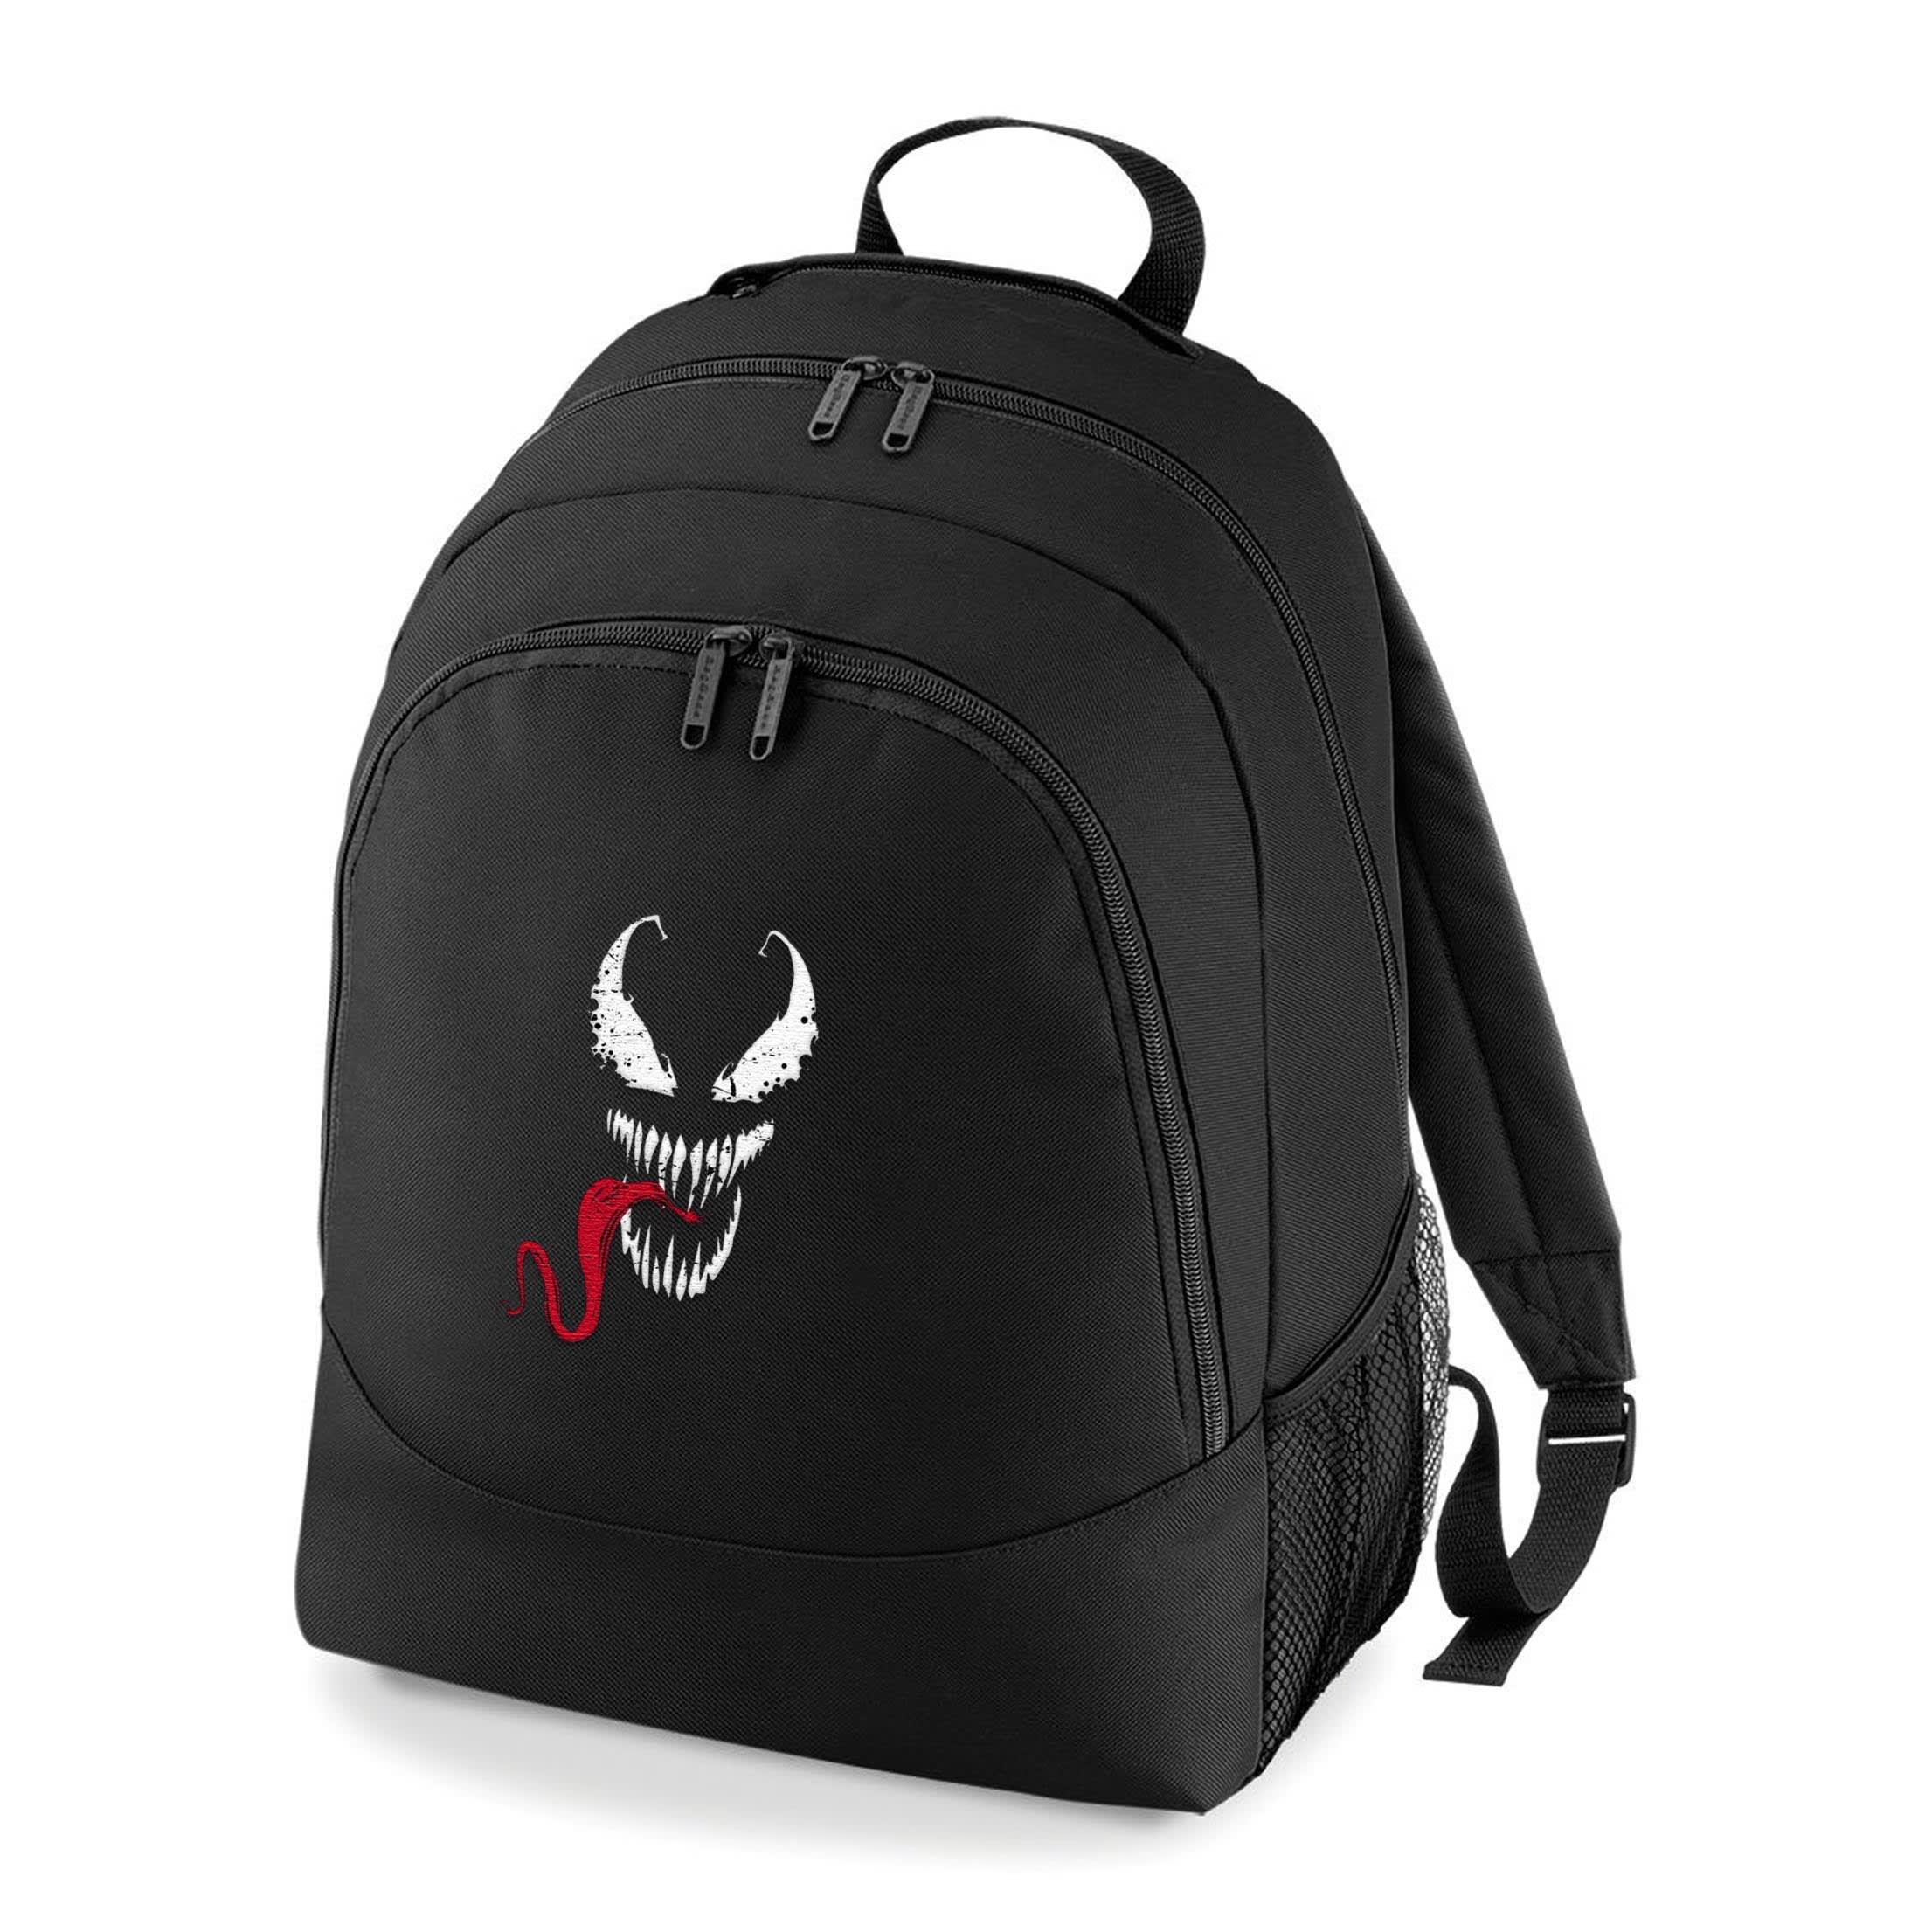 Spiderman Venom Rucksack Bag